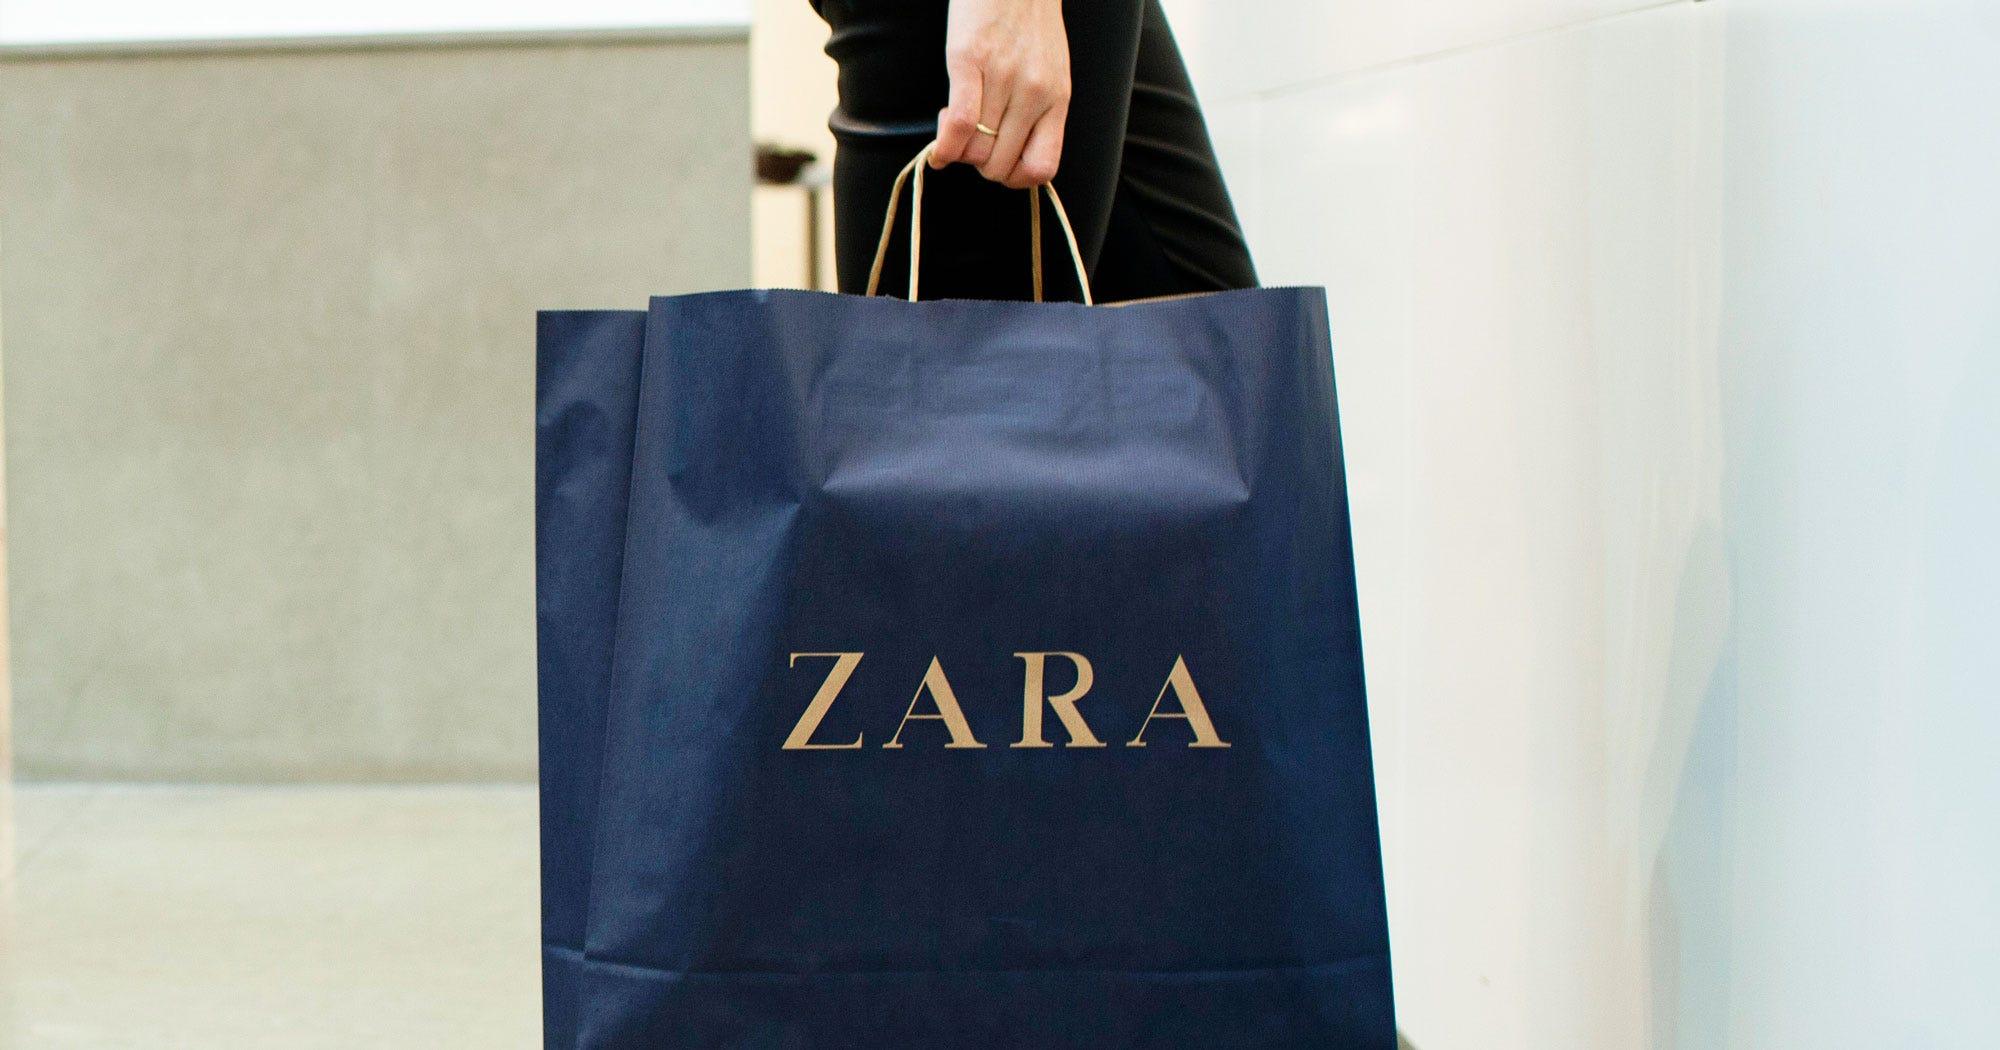 zara shopping tips employee advice zara online in store. Black Bedroom Furniture Sets. Home Design Ideas